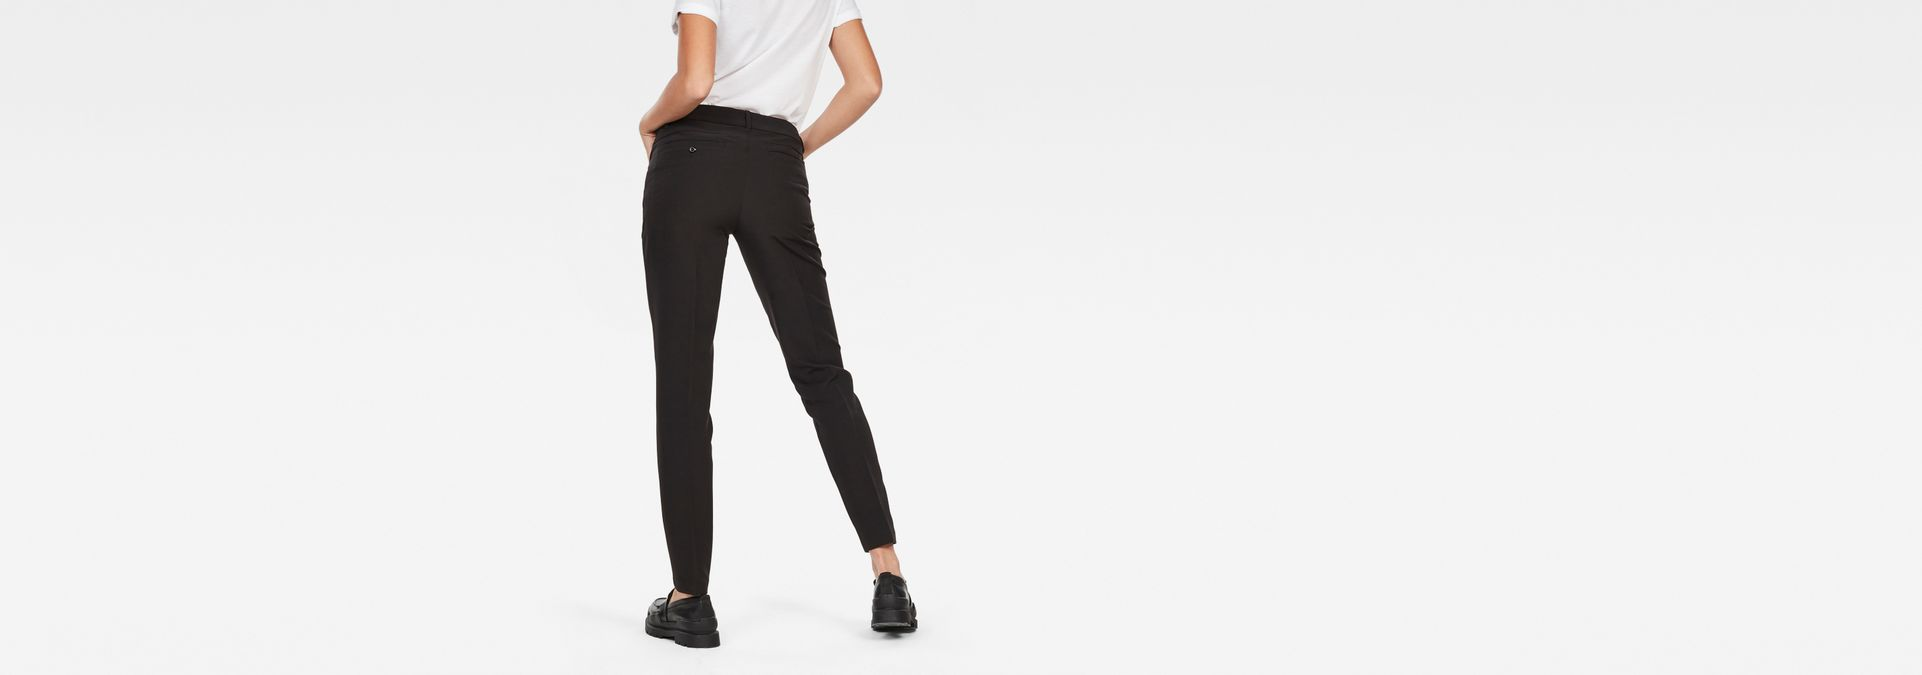 ... G-Star RAW® D-Staq Mid Waist Skinny Ankle Chino Black model back ... 3beb0a6c30a00